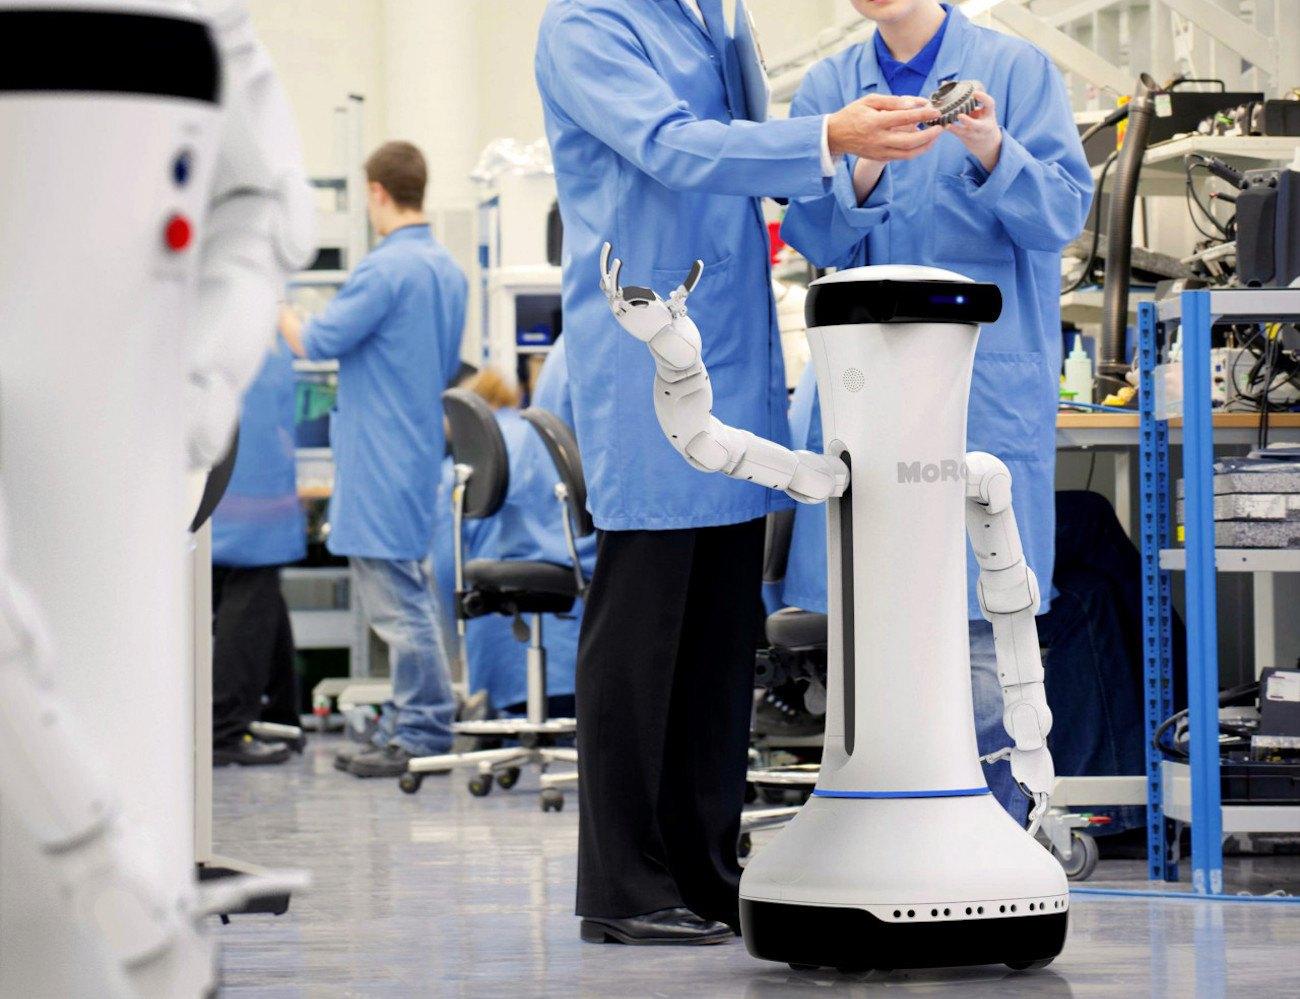 Ewaybot MoRo Mobile Robot